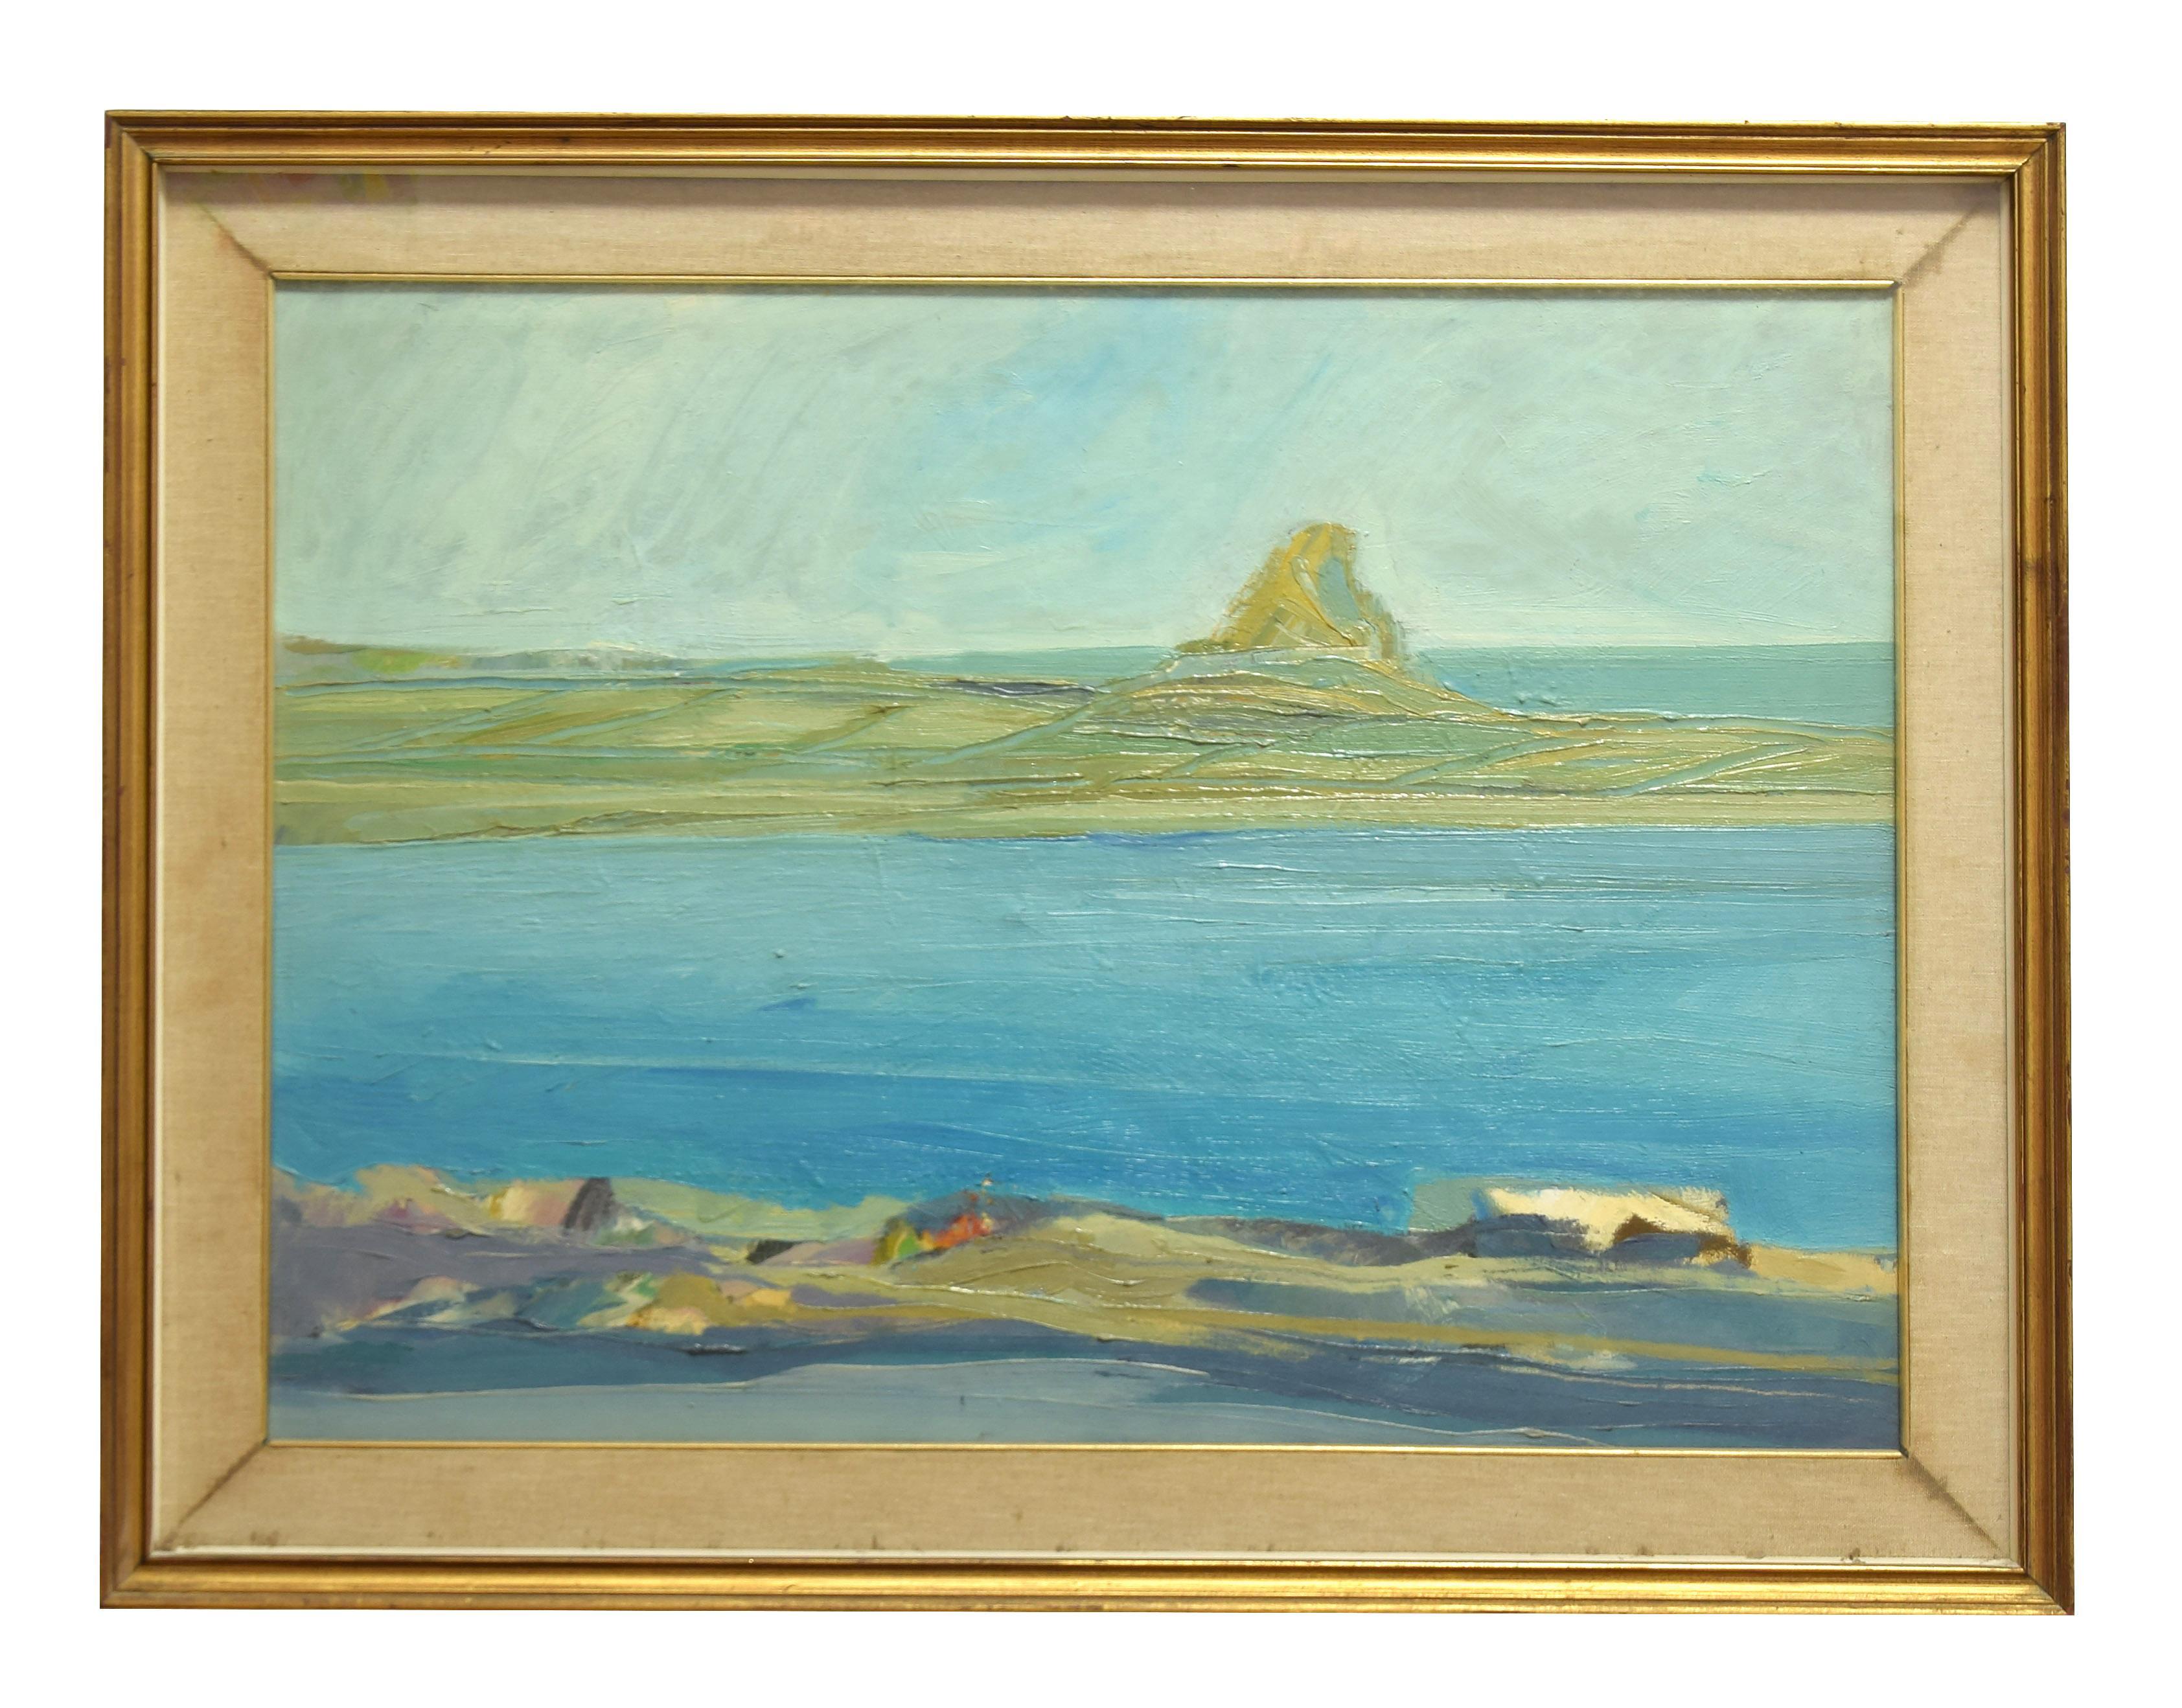 Seascape  - Oil on Canvas - Mid 20th Century